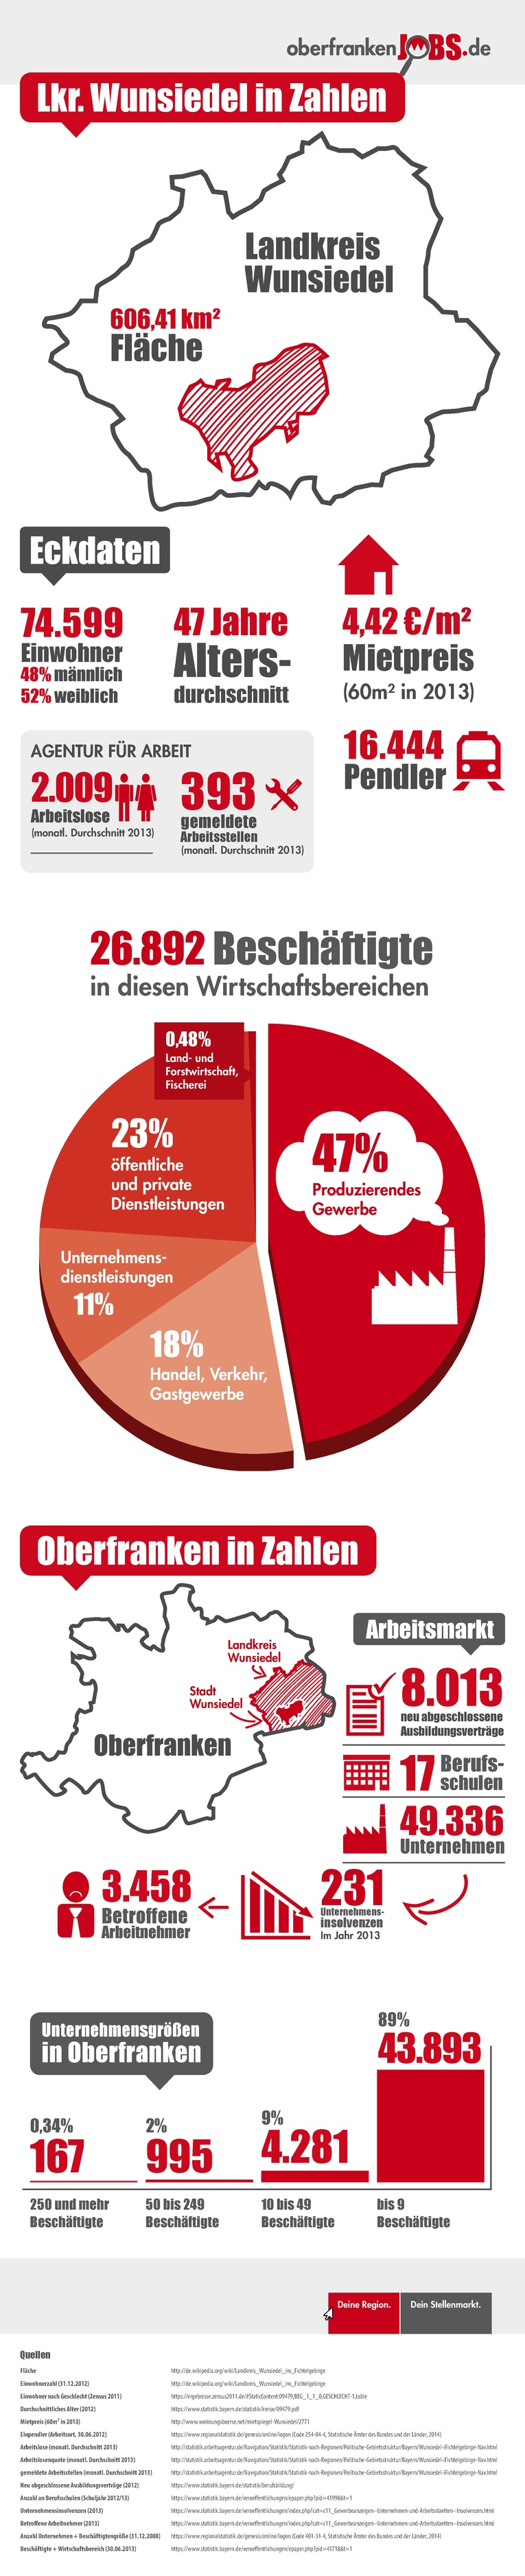 Infografik Wunsiedel im Fichtelgebirge